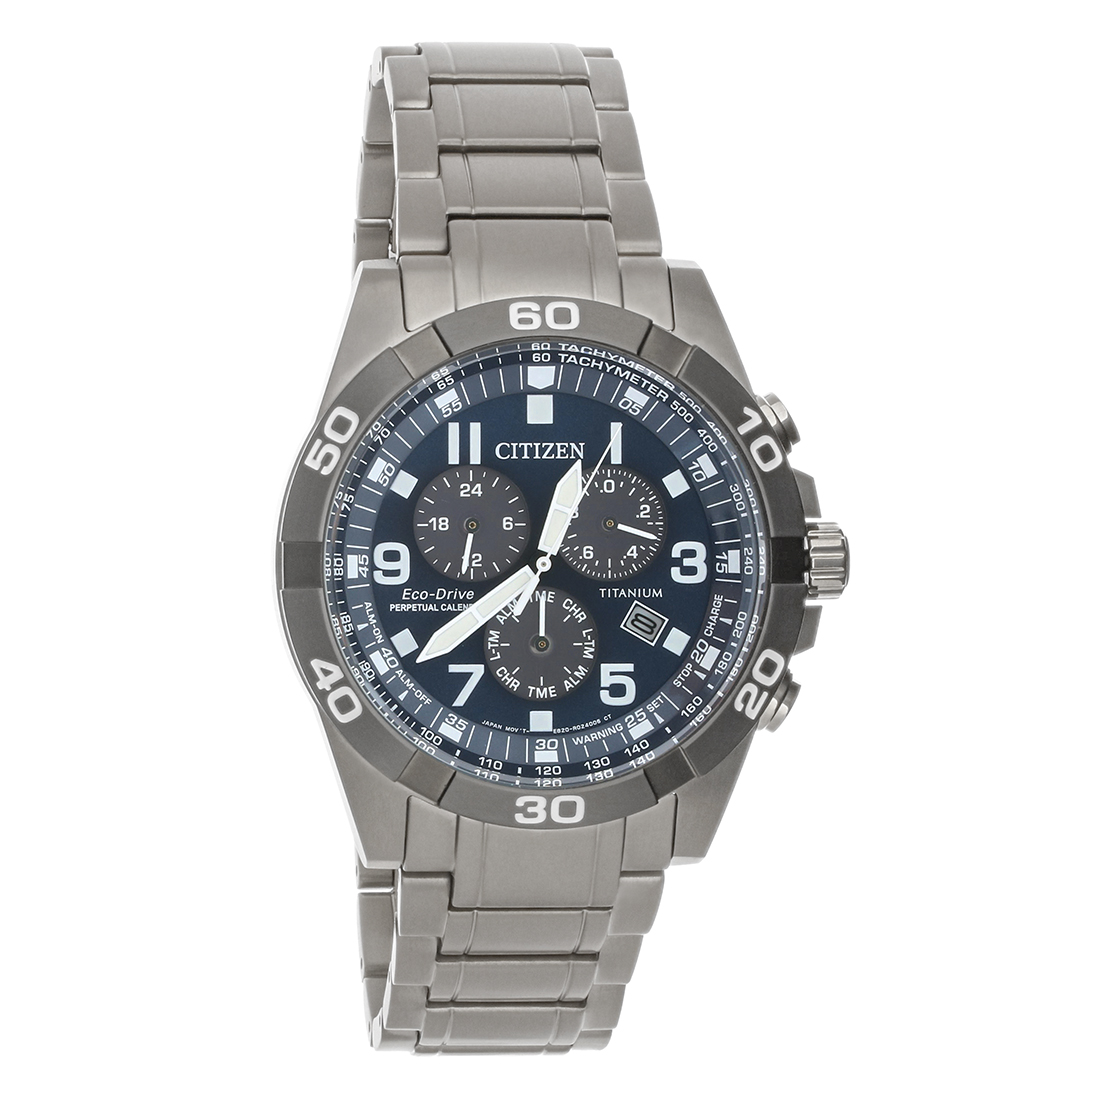 8885dfaae6a Citizen Eco Drive Mens Brycen Chronograph Super Titanium Watch BL5558-58L